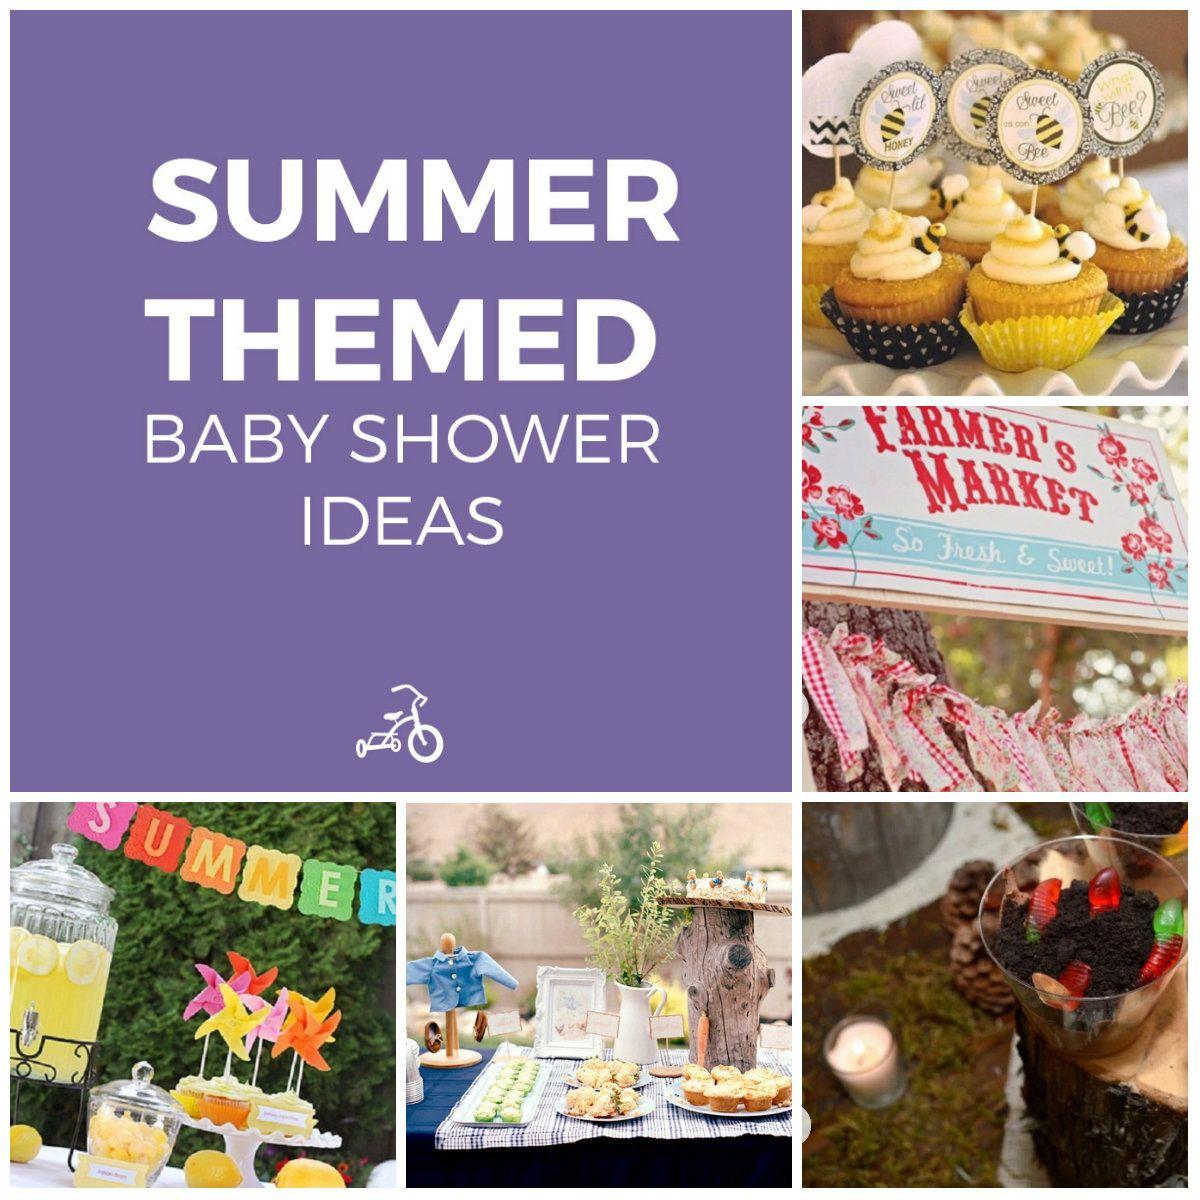 12 Sweet Summer Themed Baby Shower Ideas